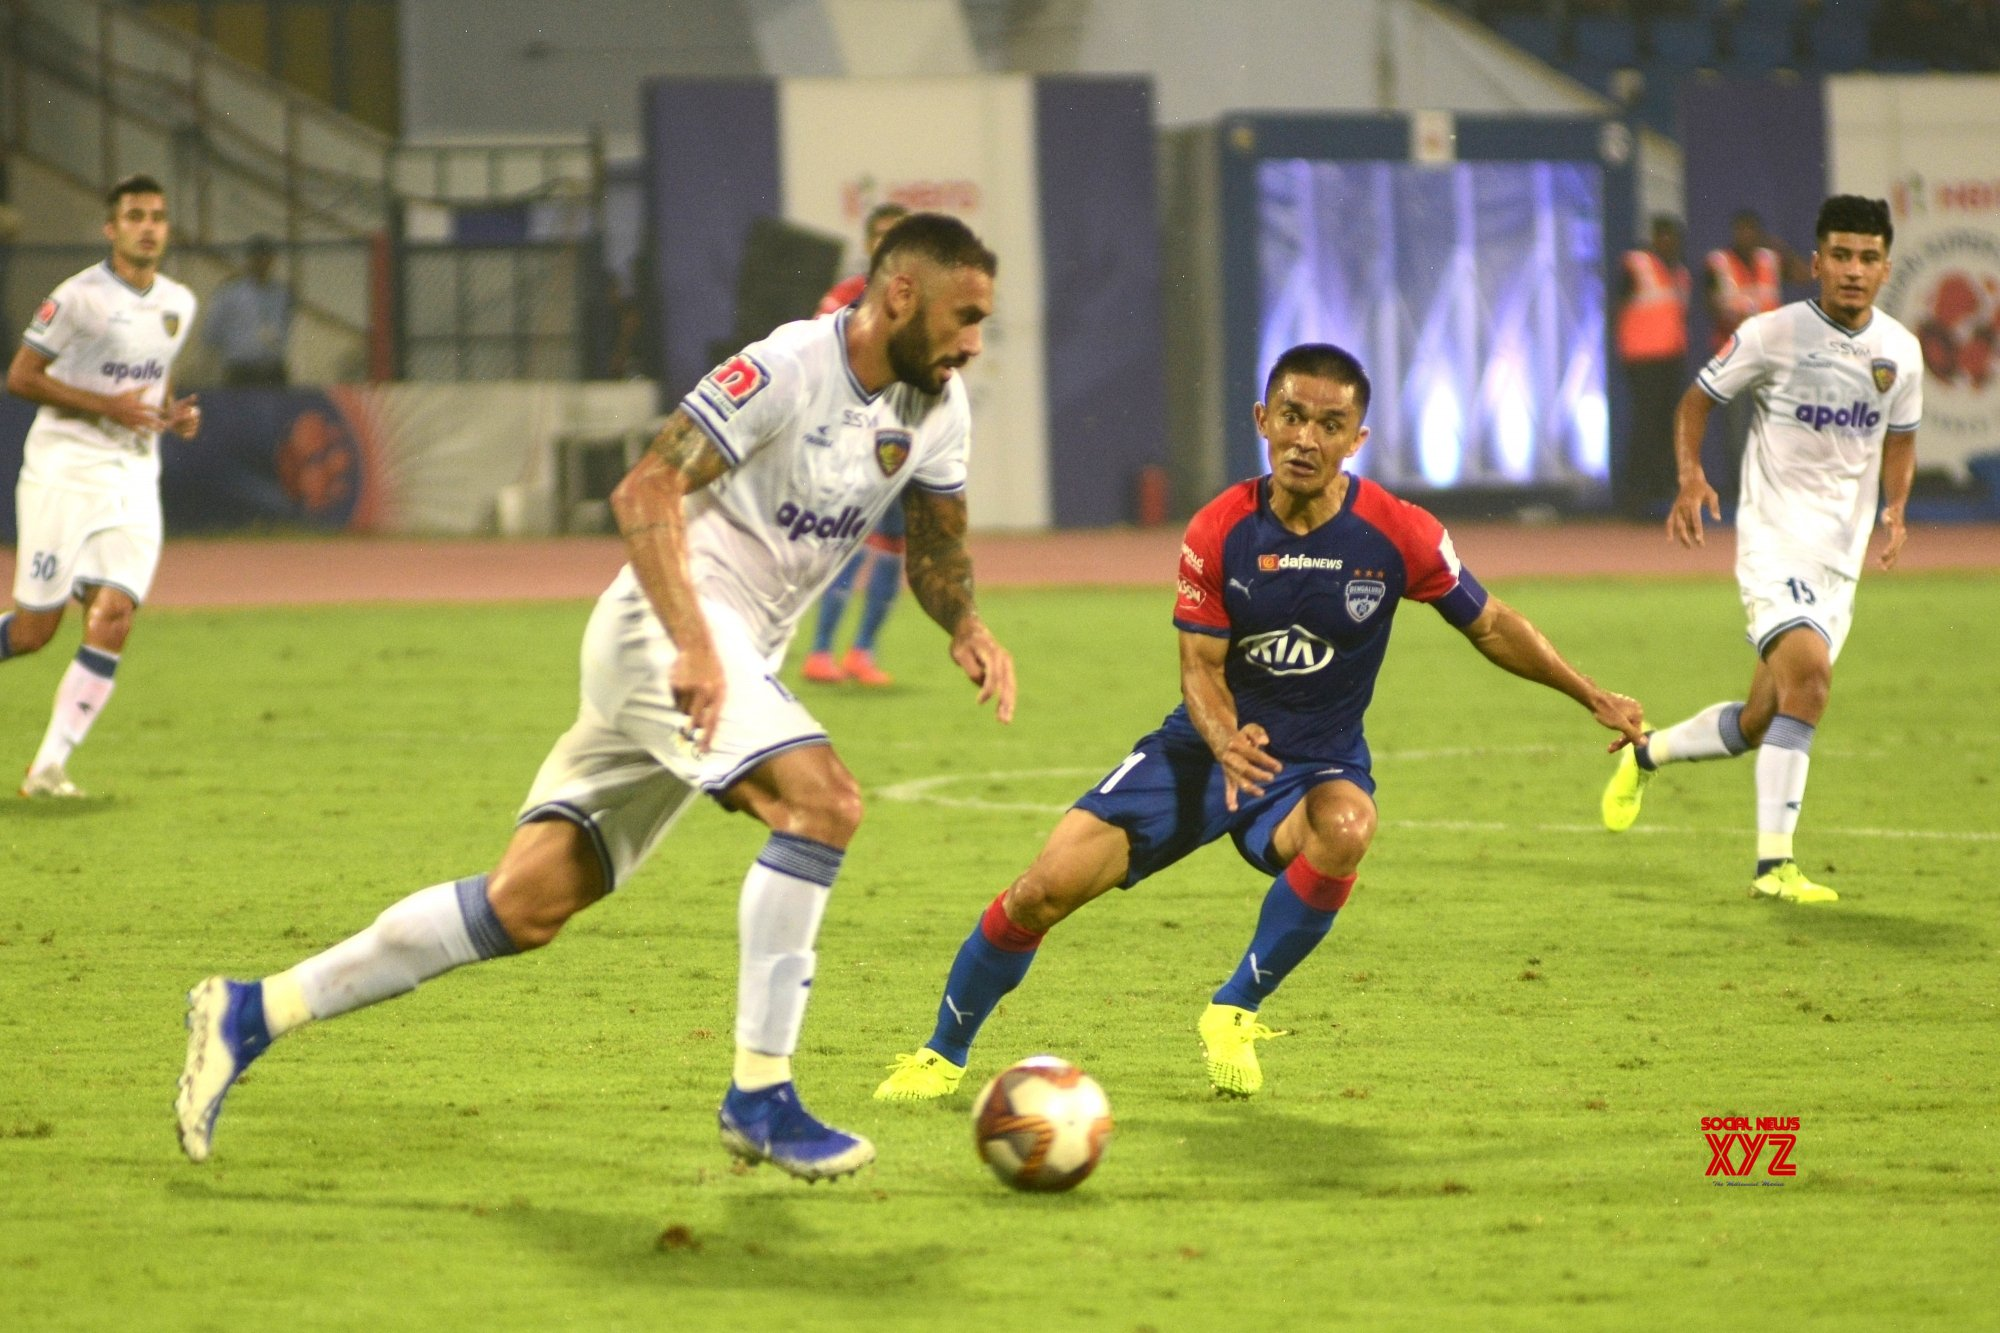 Bengaluru: ISL - Bengaluru FC Vs Chennaiyan FC (Batch - 3) #Gallery